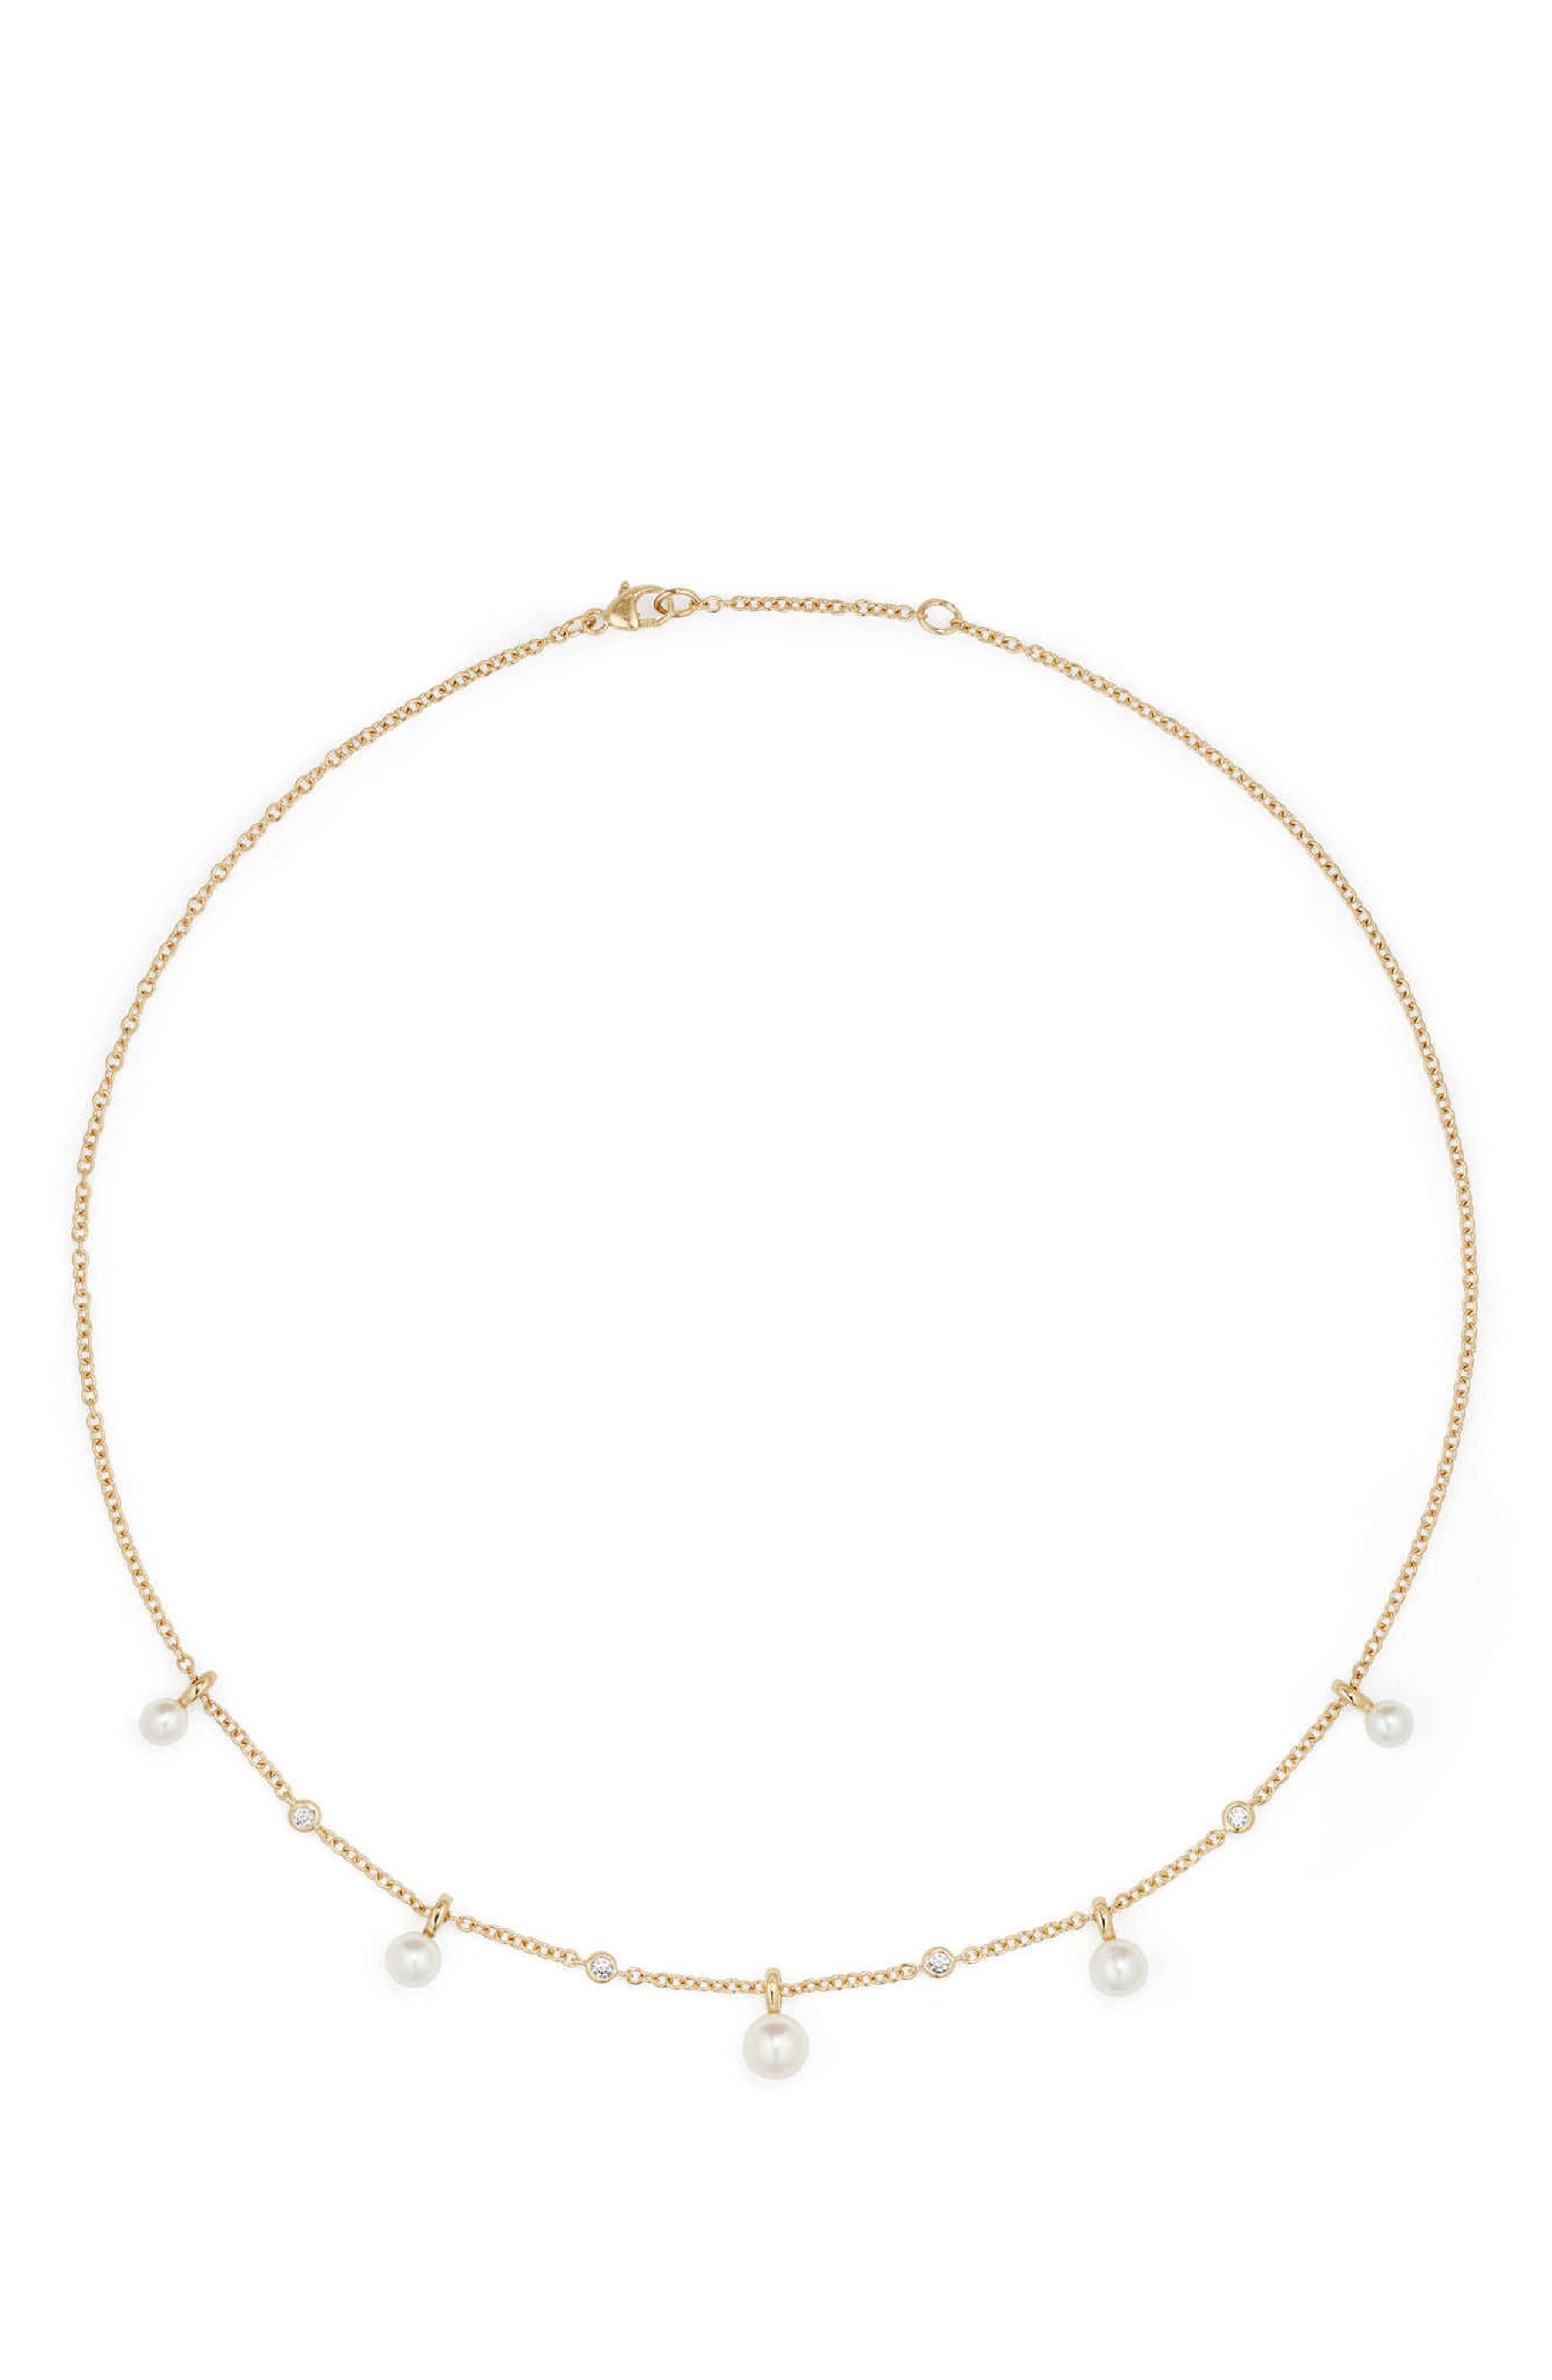 Petite Perle Pearl & Diamond Fringe Necklace in 18k Gold,                         Main,                         color, Gold/ Diamond/ Pearl